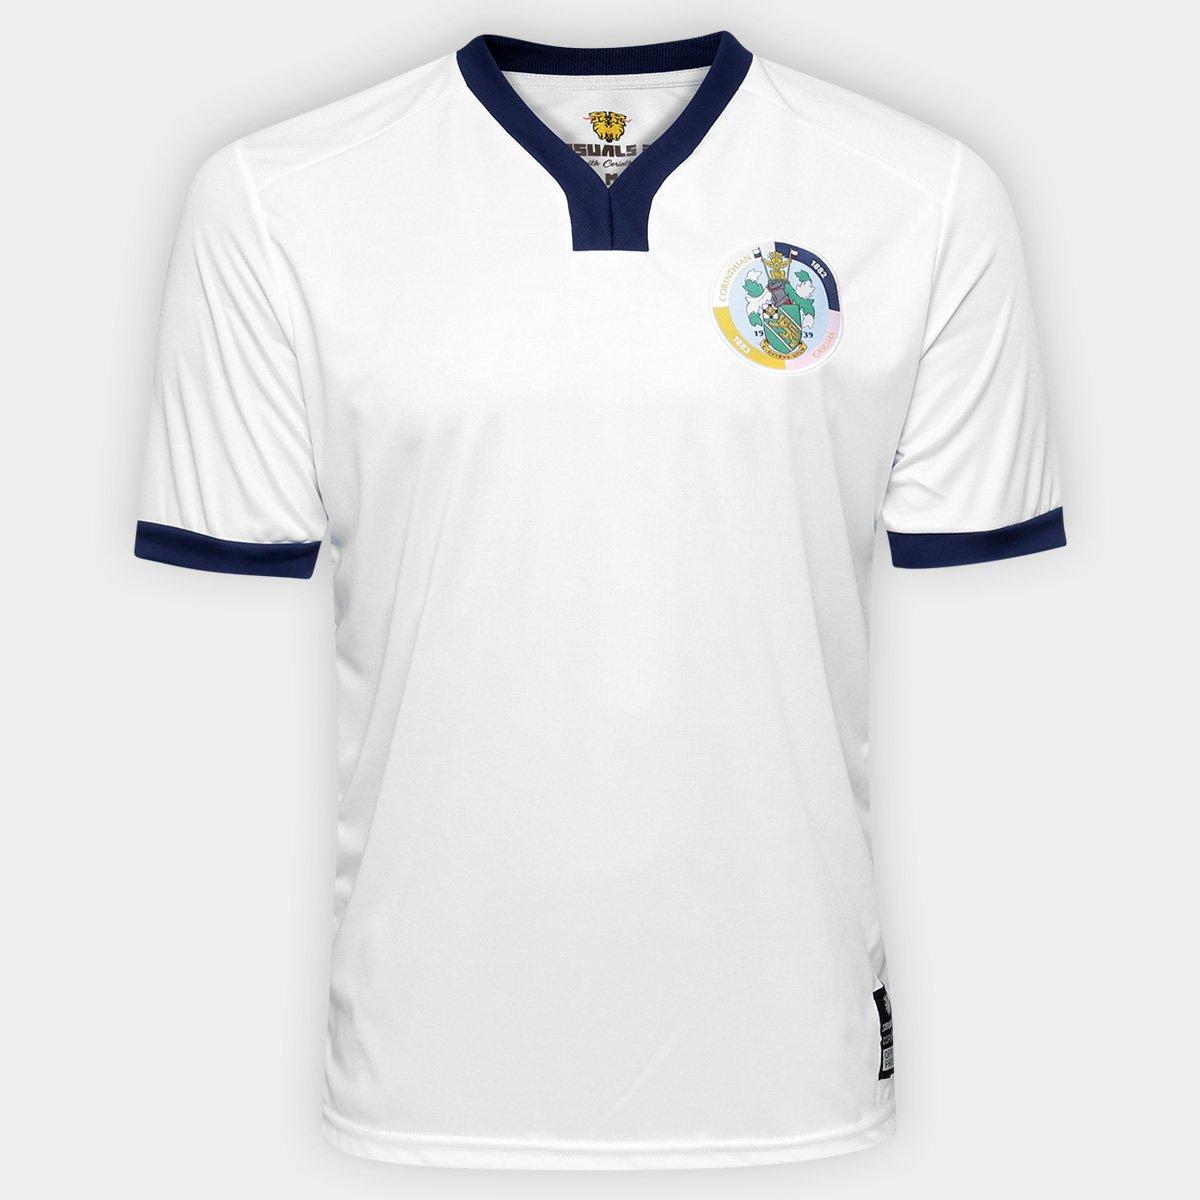 Camisa Corinthian Casuals Away 17 18 - Torcedor Masculina - Branco ... b5f03e1f6b8bf